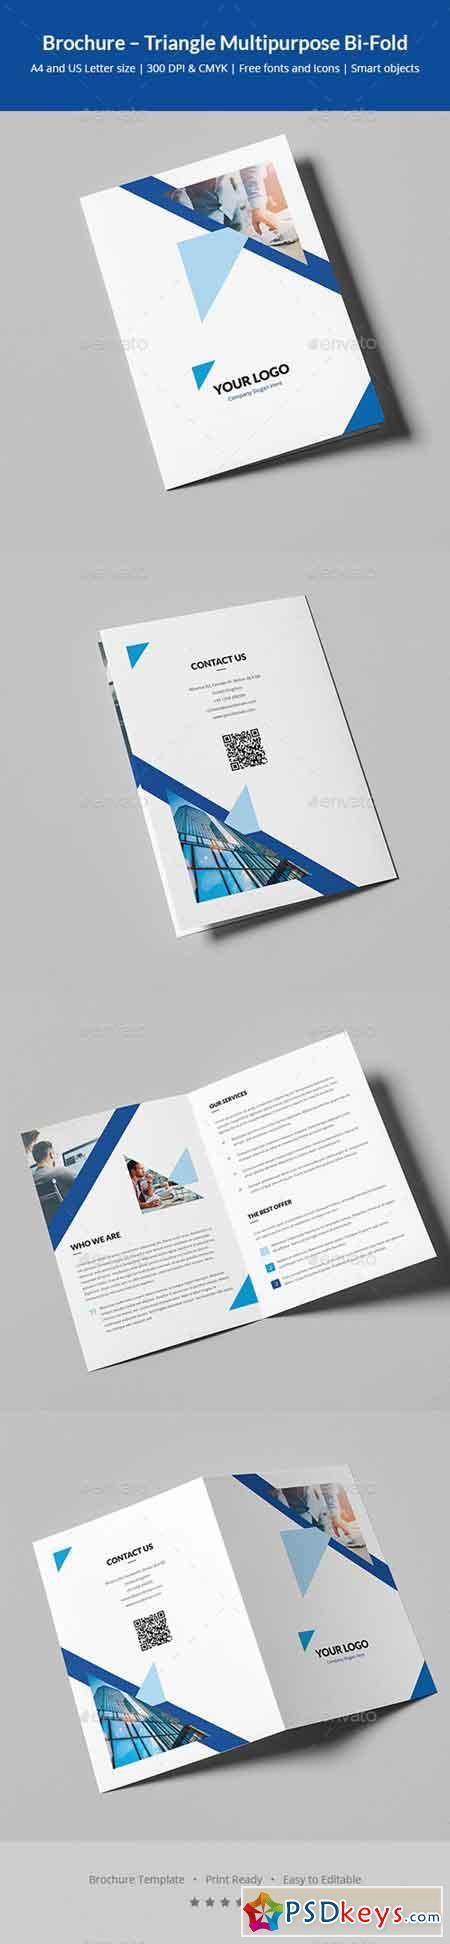 Brochure – Triangle Multipurpose Bi-Fold 20592047